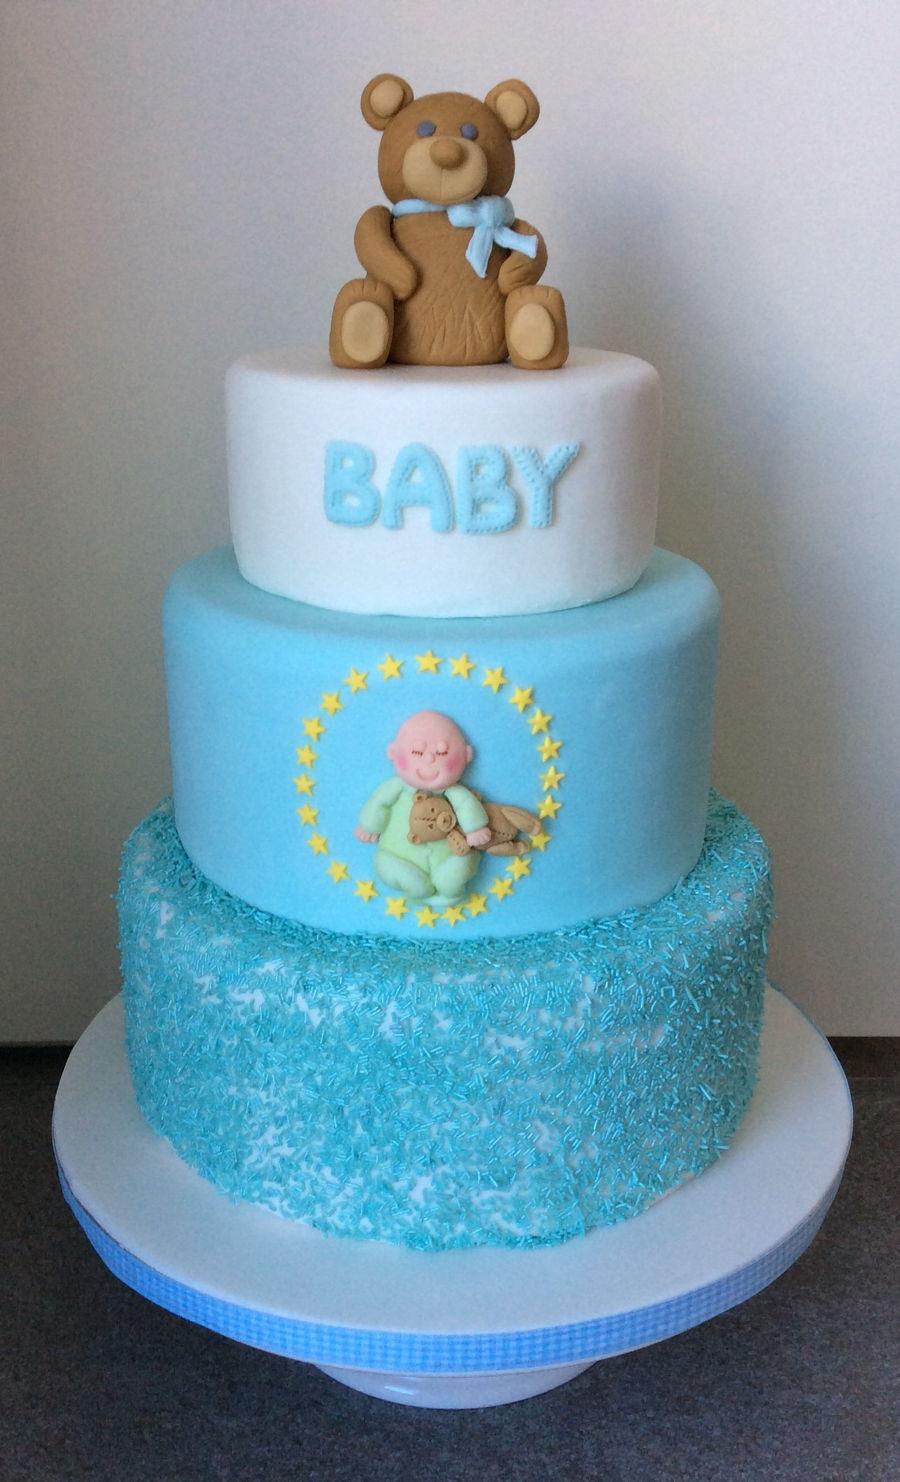 New Baby Boy Cake Cakecentral Com